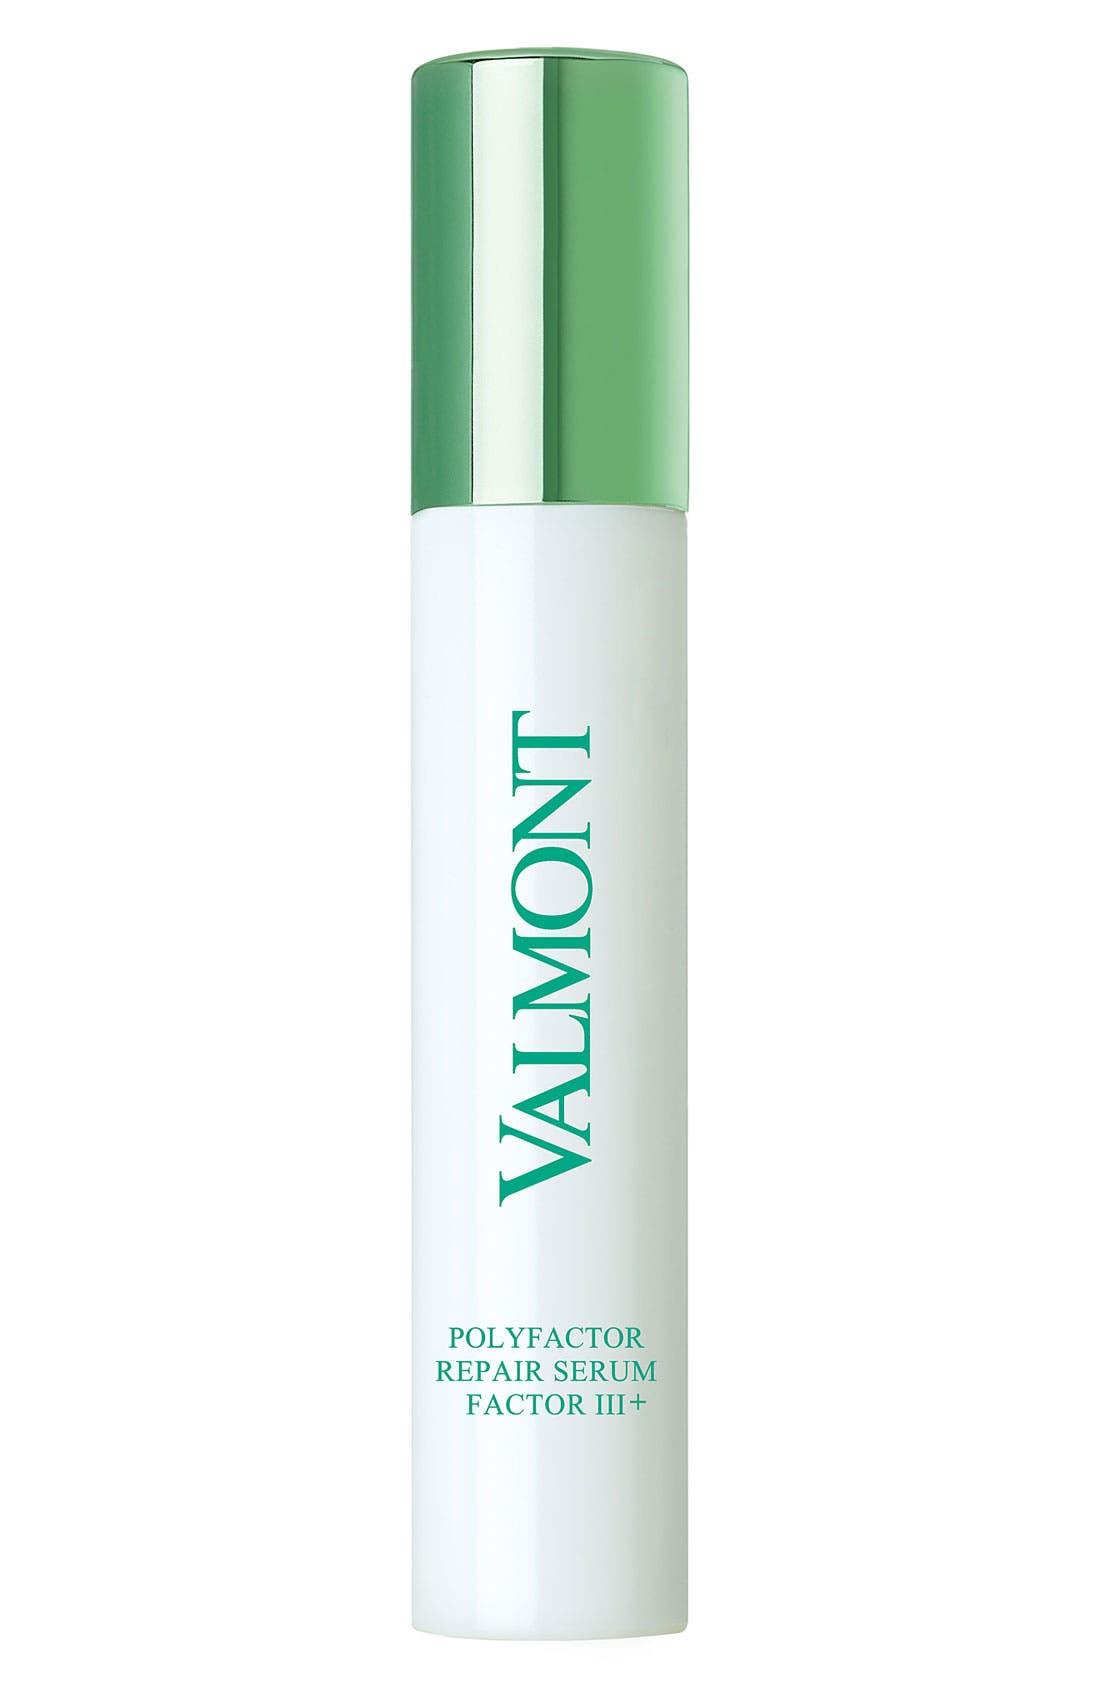 Valmont 'Polyfactor Repair Factor III' Serum